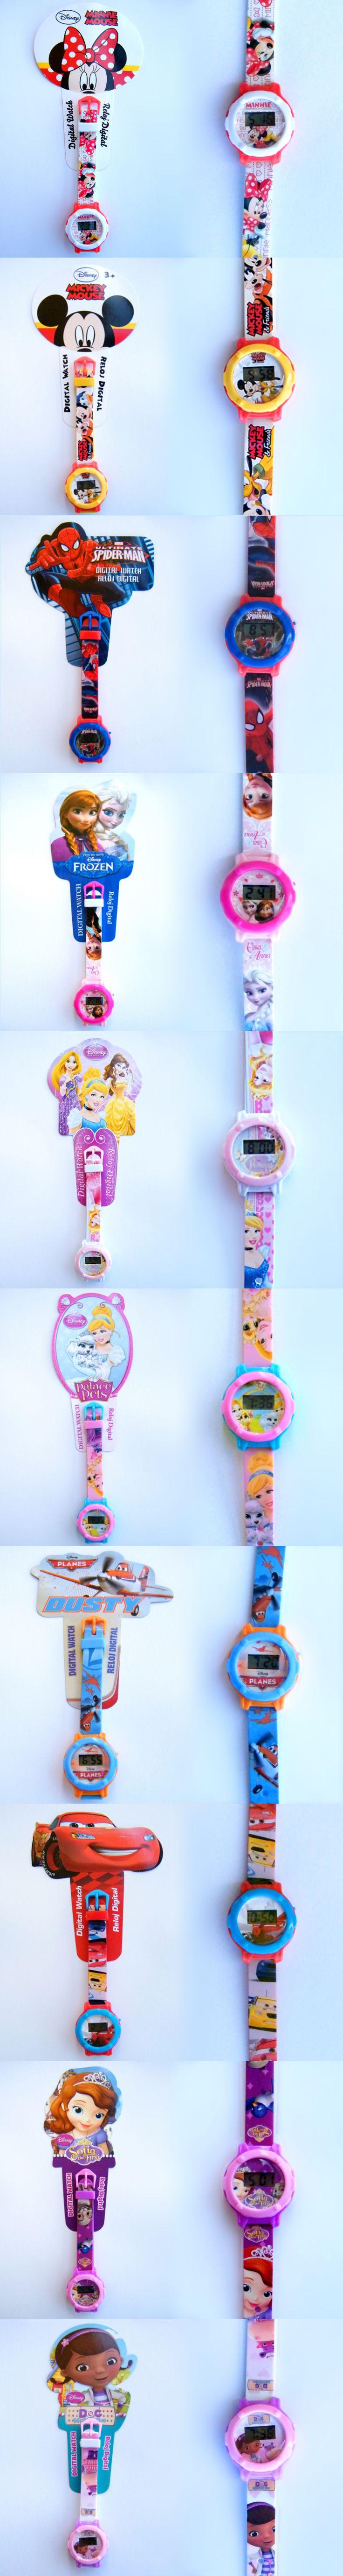 Original DISNEY watches for kids; Mickey, Minnie, Princesses, Cars, Spiderman, Sofia, Frozen, Doc McStuffins